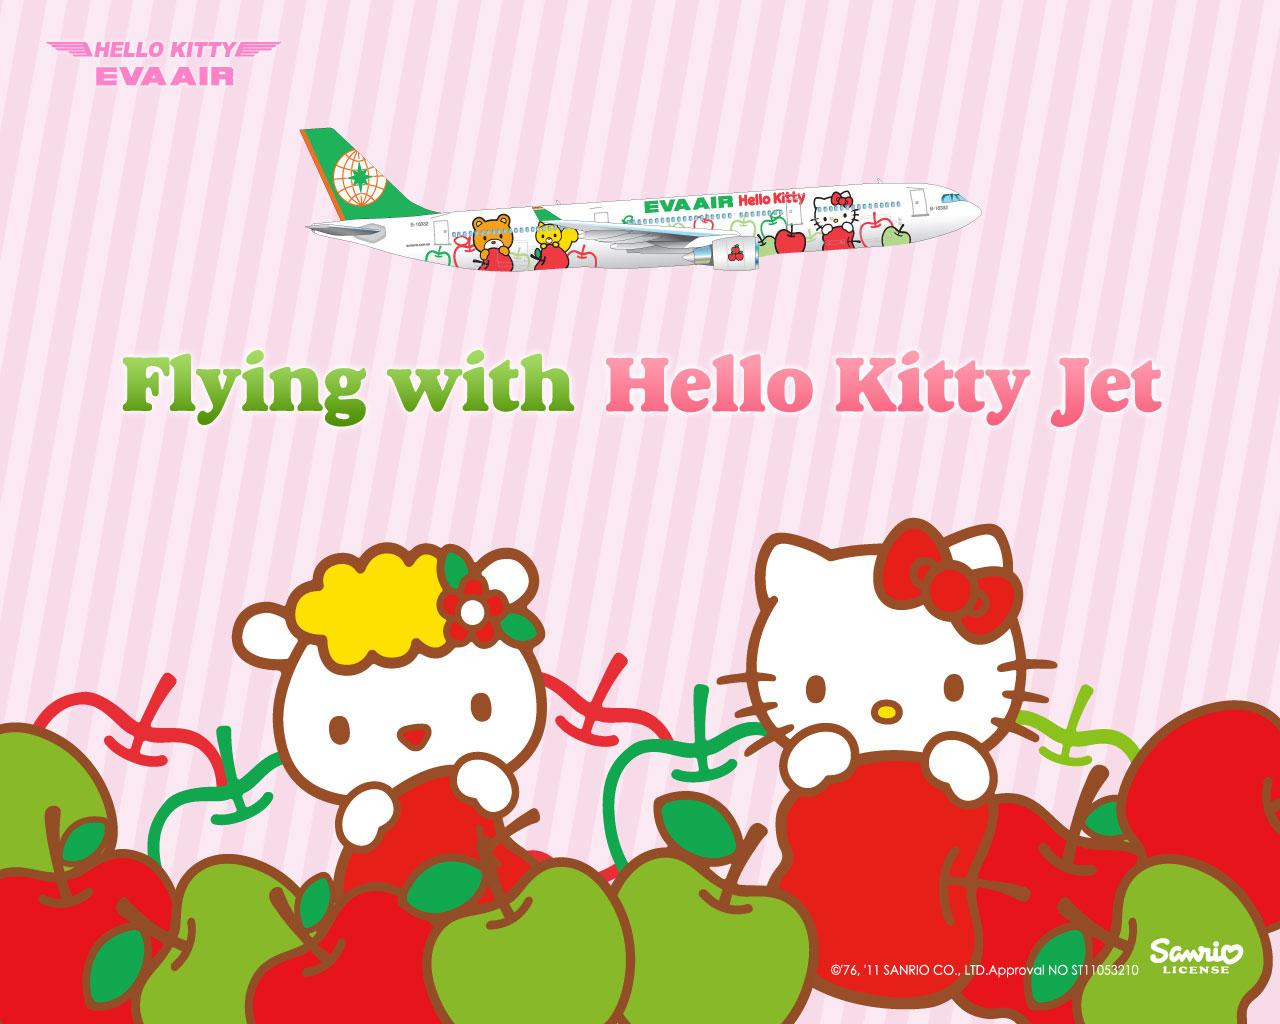 Cool Wallpaper Hello Kitty Calendar - hellokitty_wallpaper_v3  2018_497848.jpg